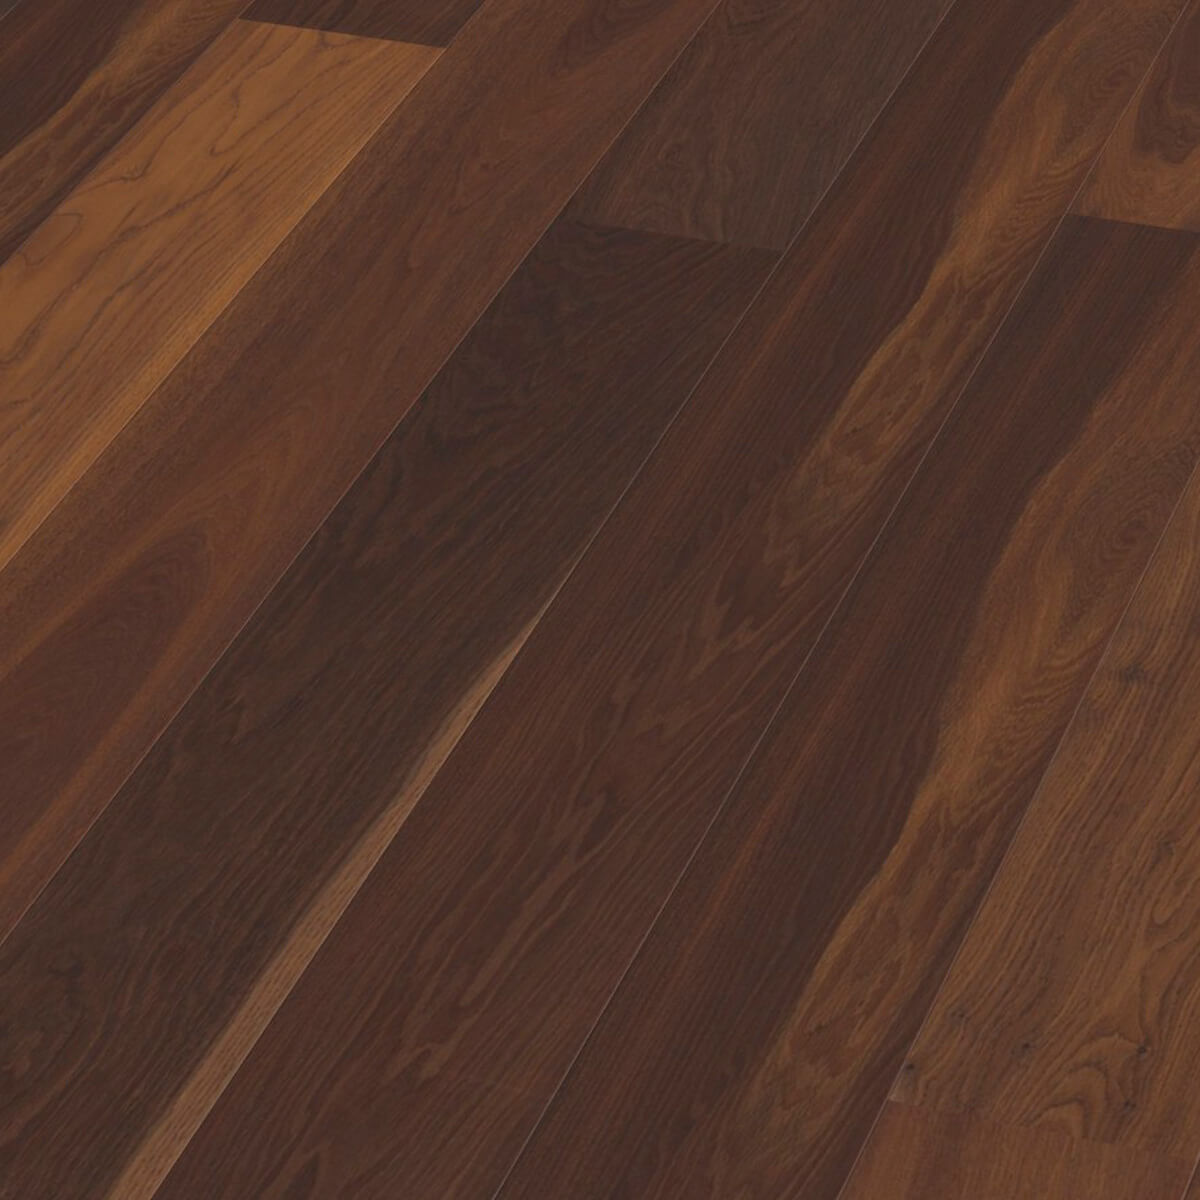 Parchet stratificat stejar smoked marcato plank_1